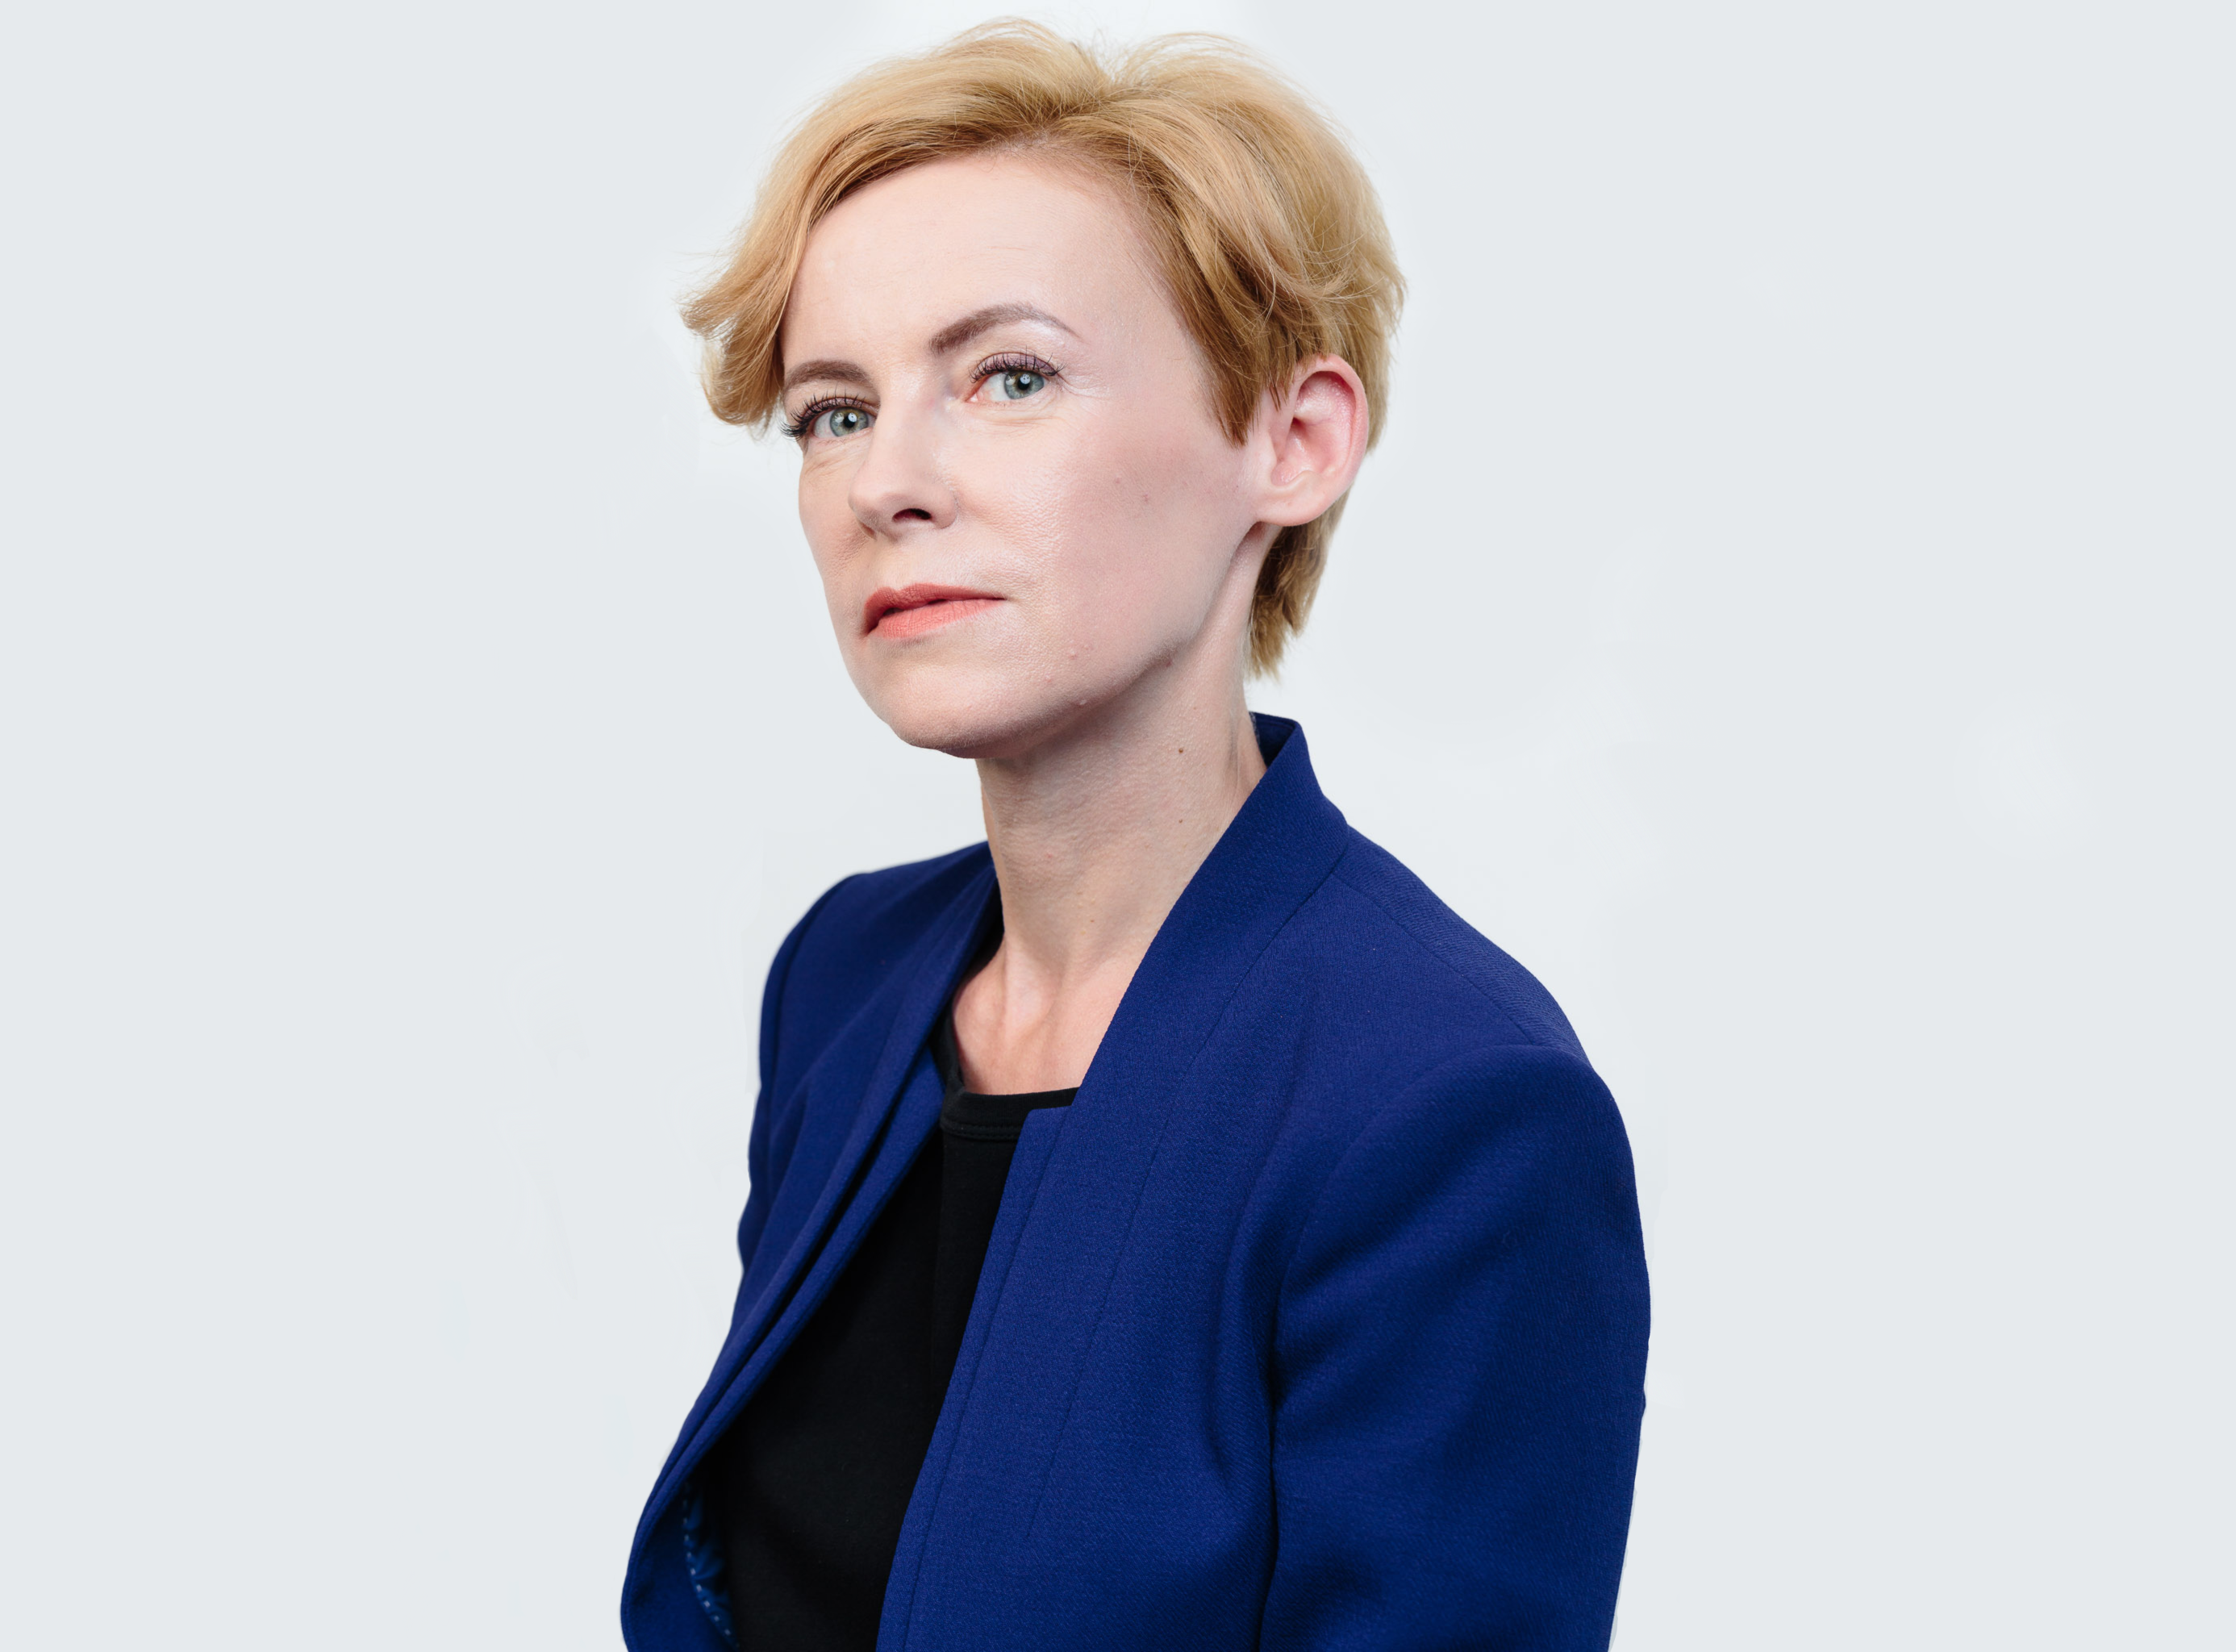 Marija Golubeva: Skolotāju algas. Nemelosim sev